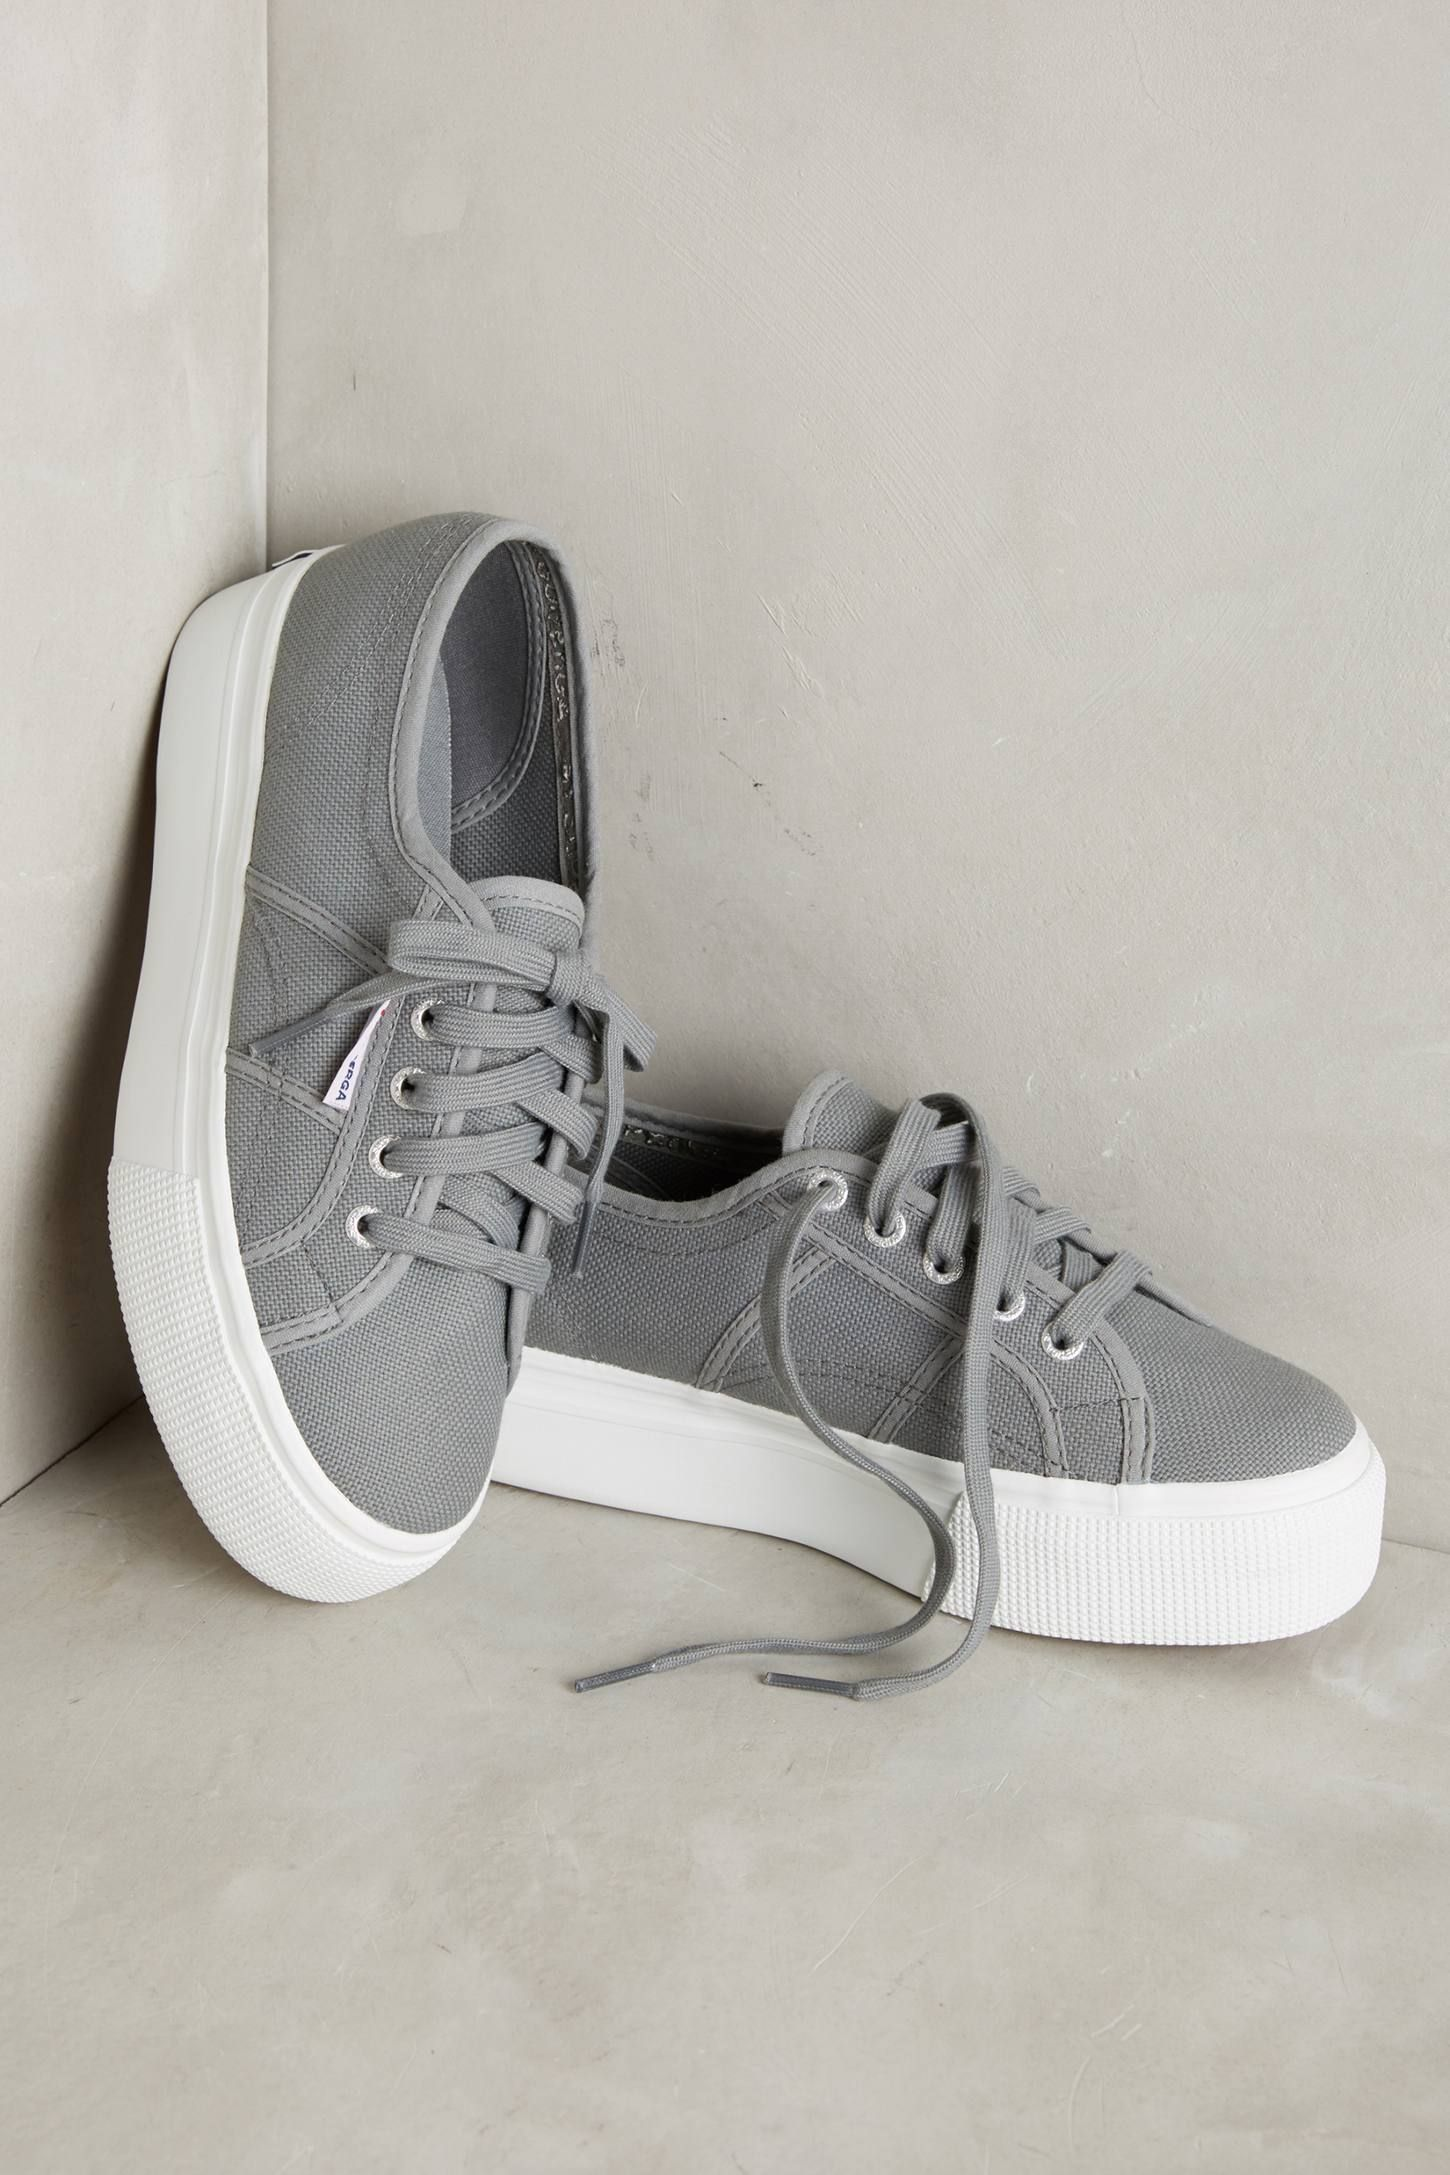 491116504652 Superga Platform Sneakers